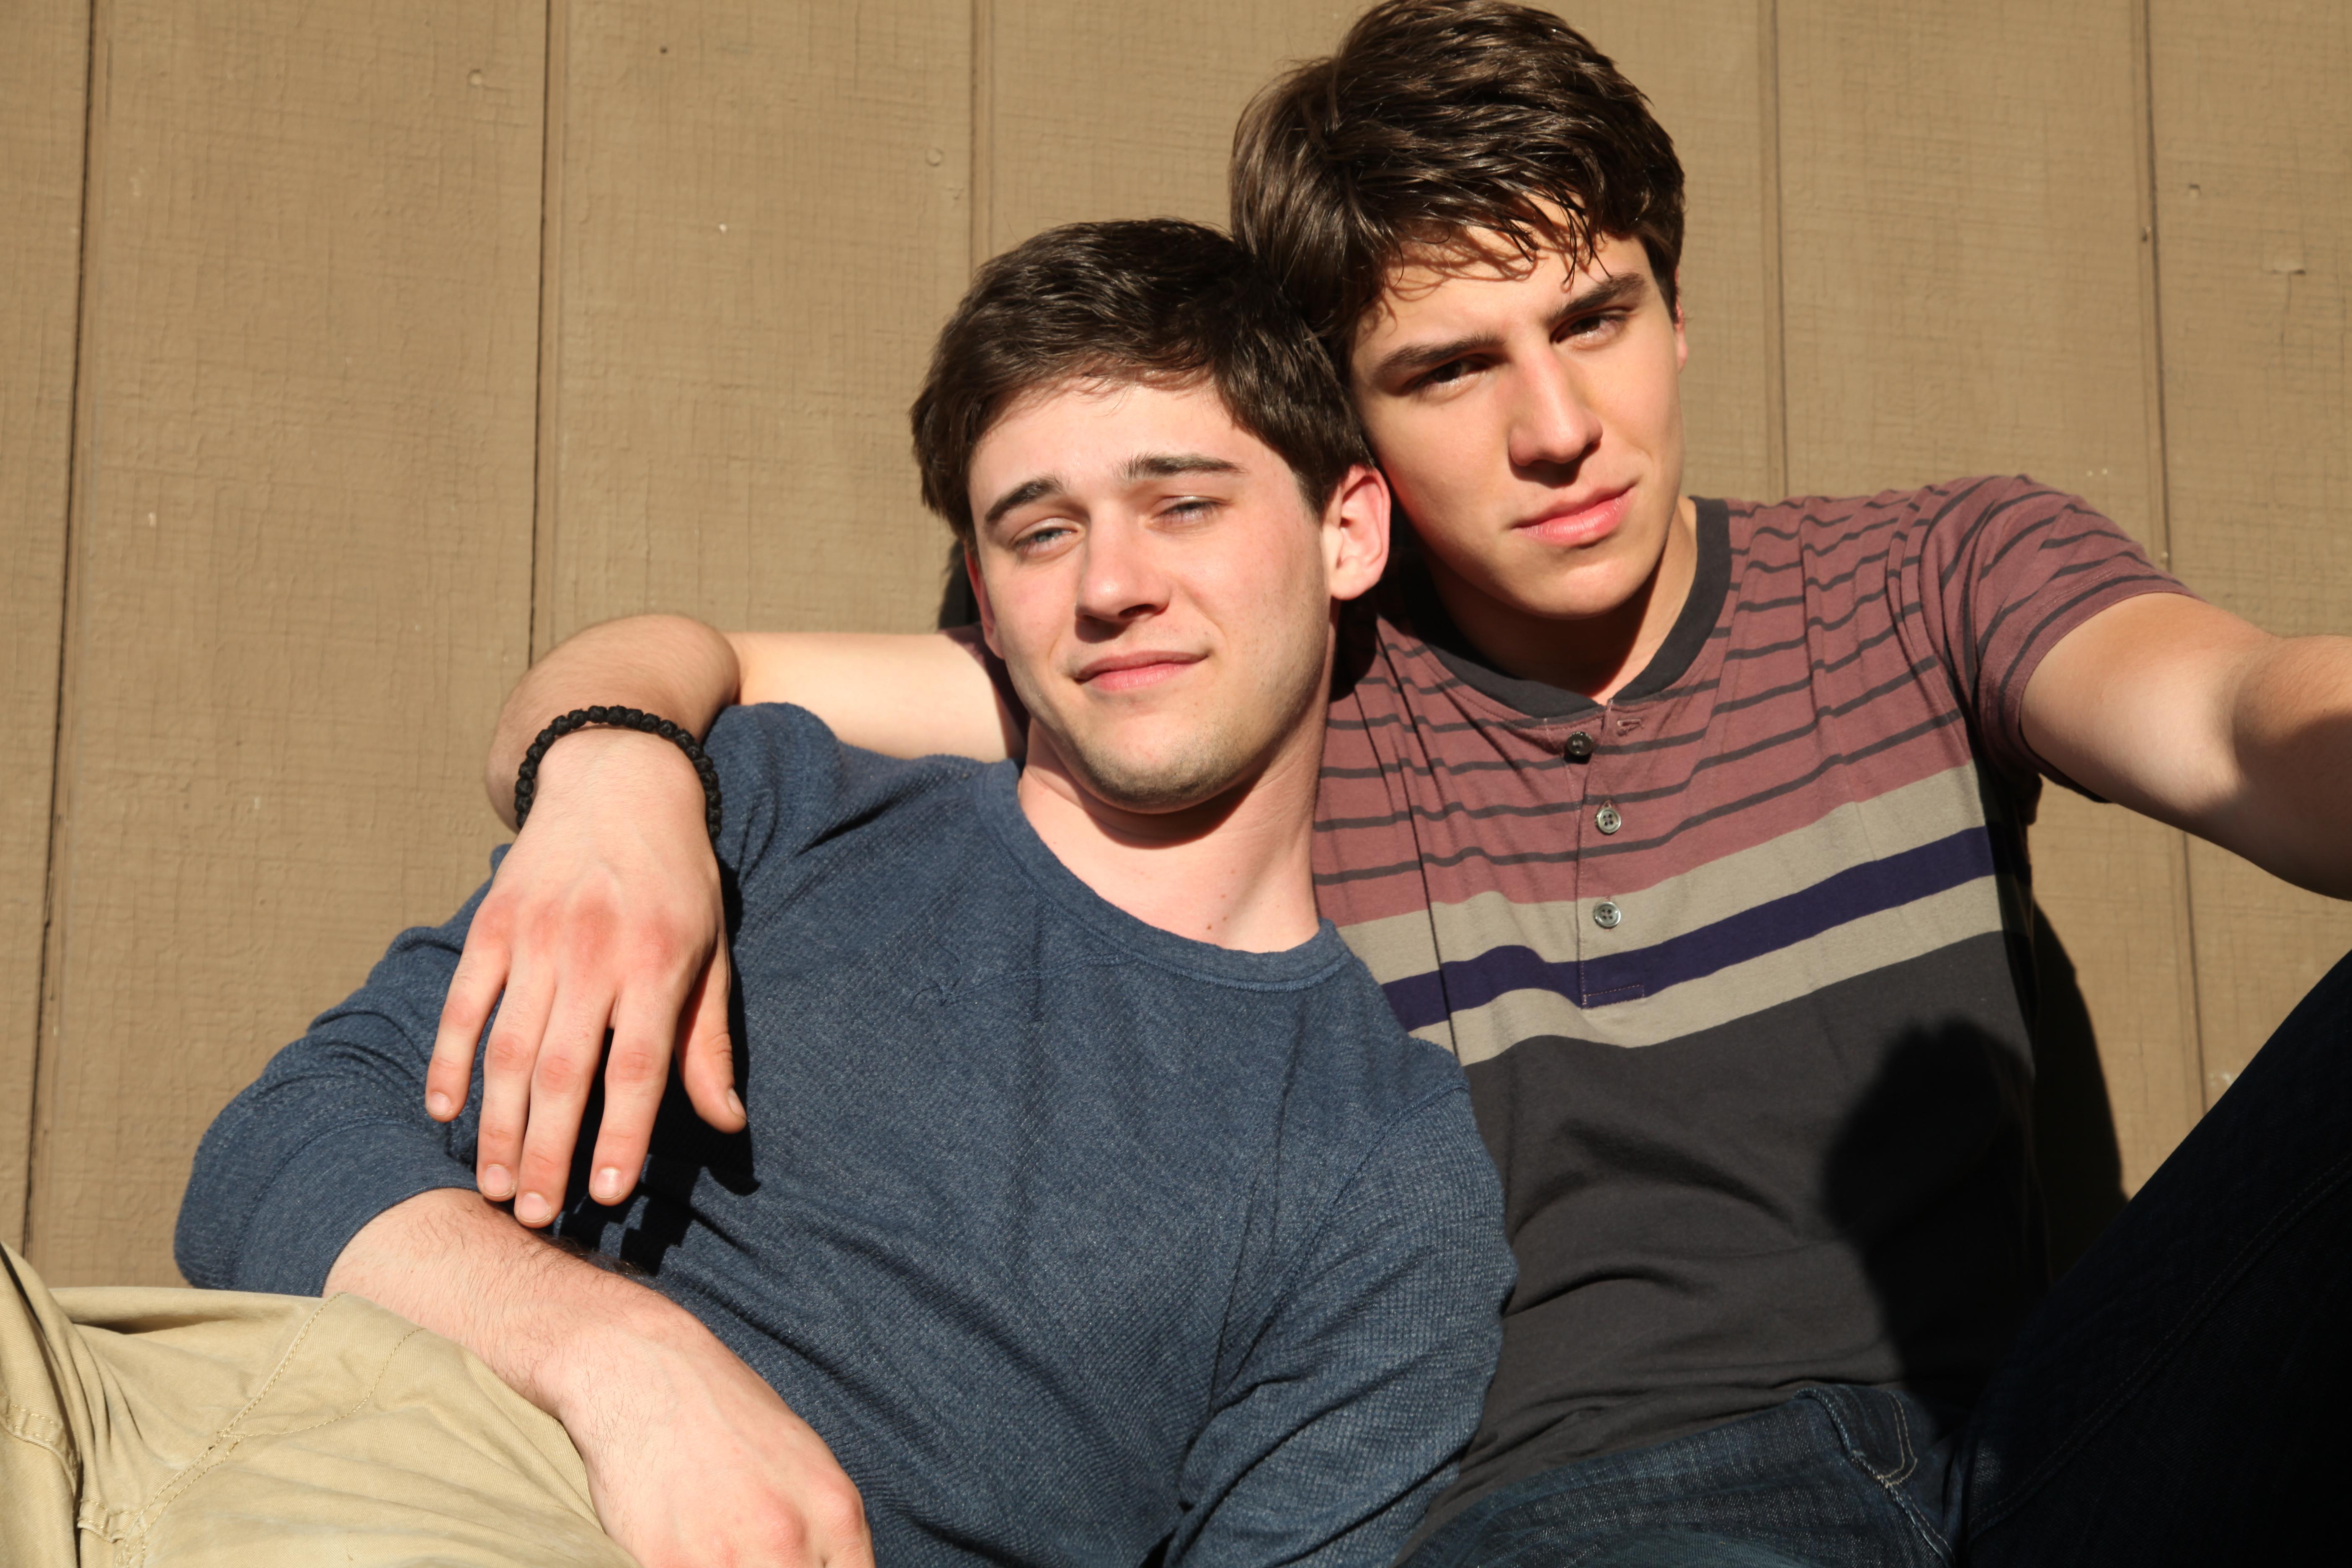 Josh and Michael